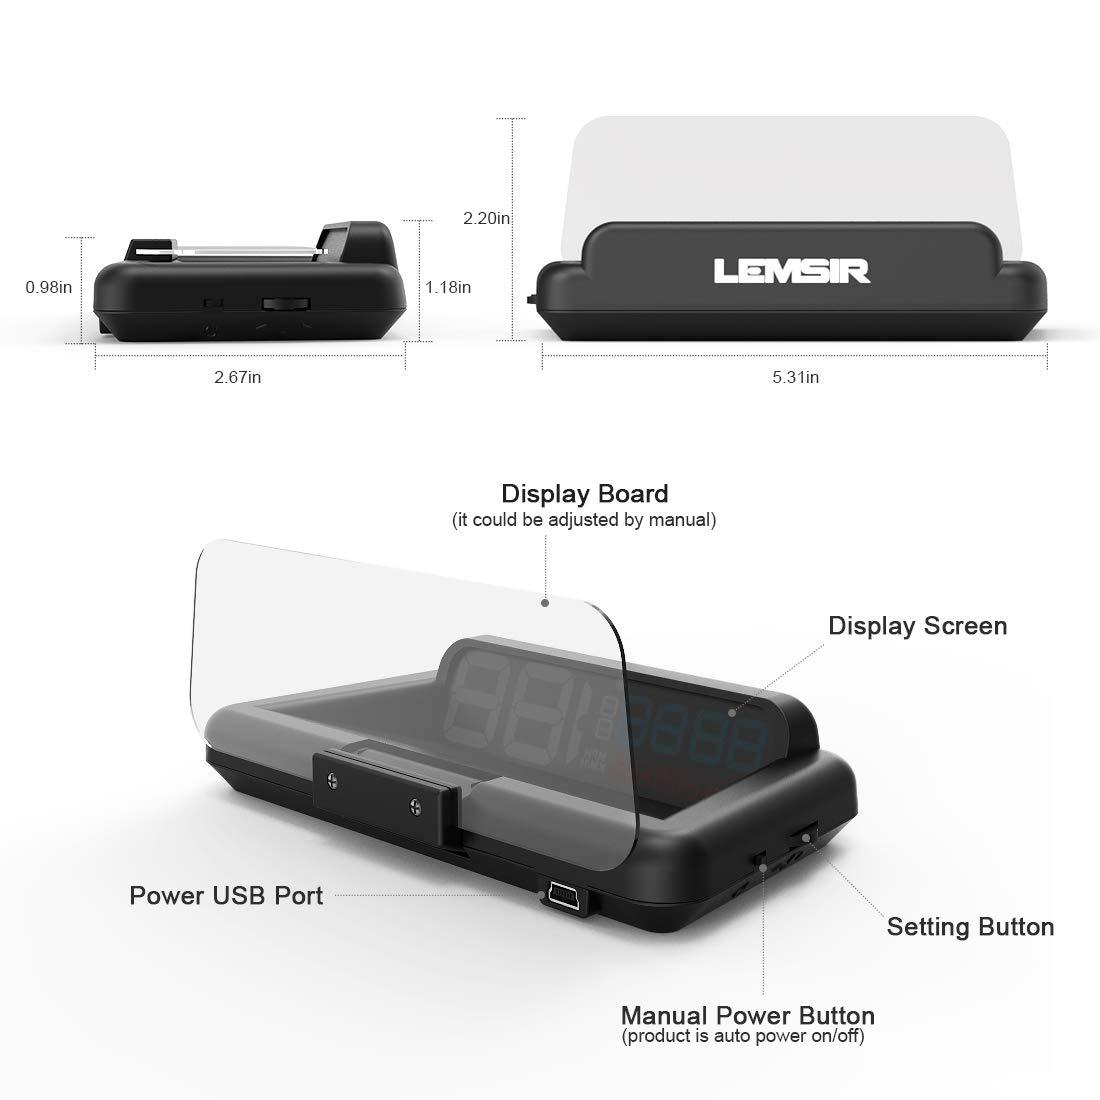 Head-Up Display, LEMSIR Car HUD Speedometer OBD II/EUOBD Interface with Foldable Display Board, Digital HD LED Projector Display Speed MPH Driving Reminder Alarm Light Sensor by LEMSIR (Image #8)